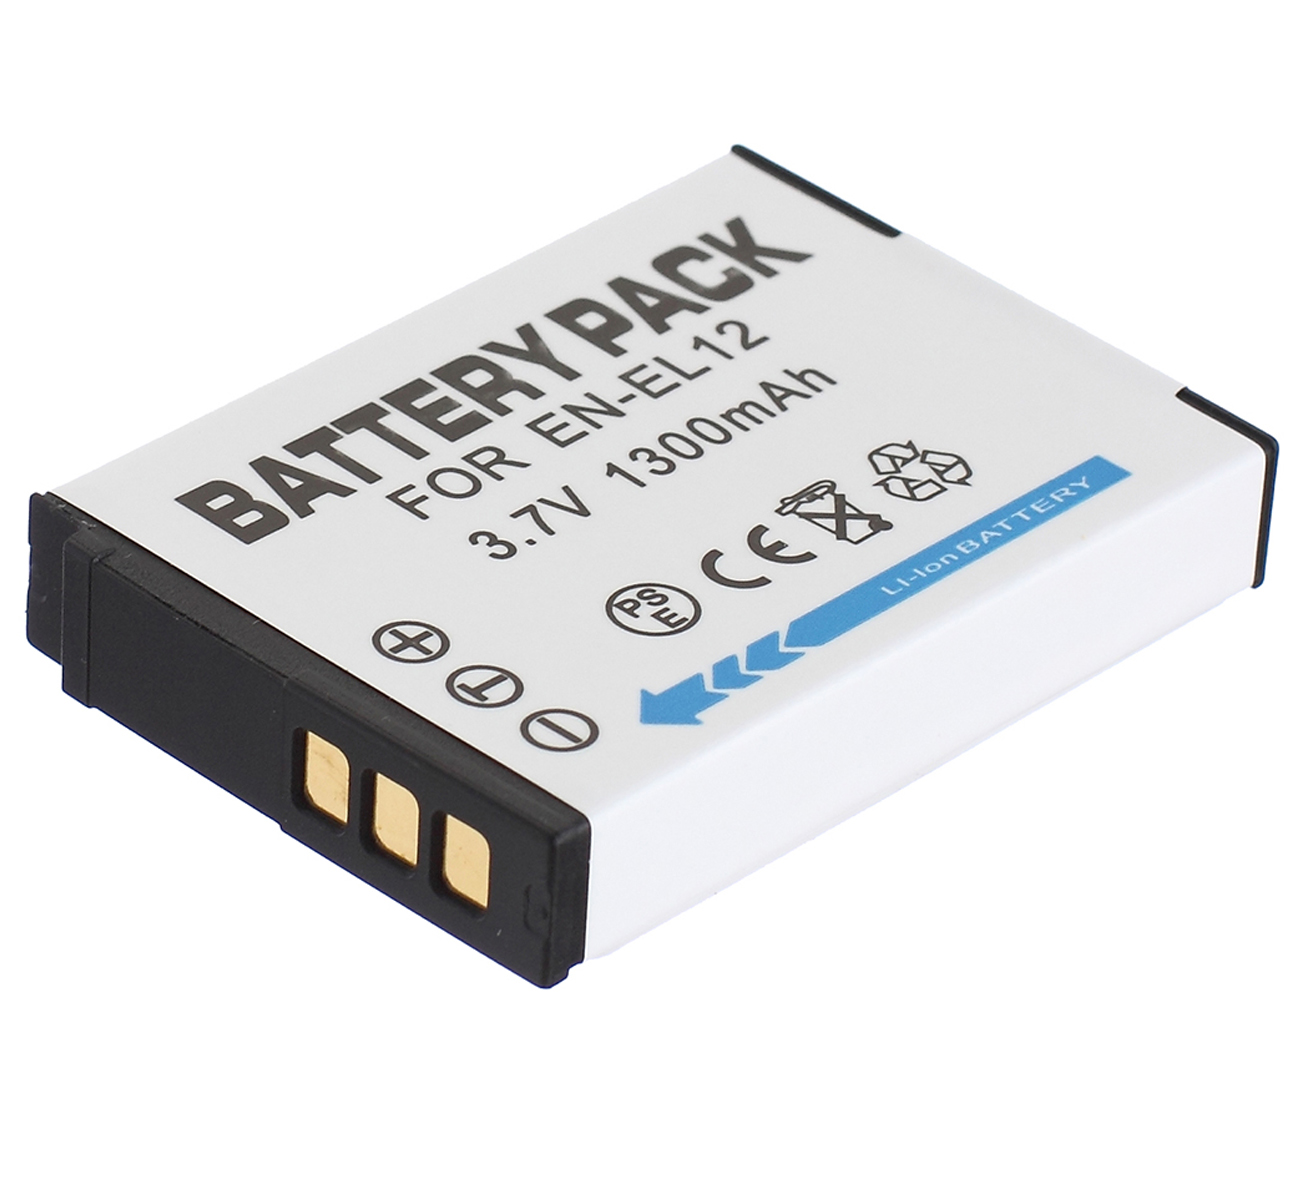 Dutiful Battery Pack For Nikon En-el12 En-el 12 Enel12 Lithium-ion Rechargeable